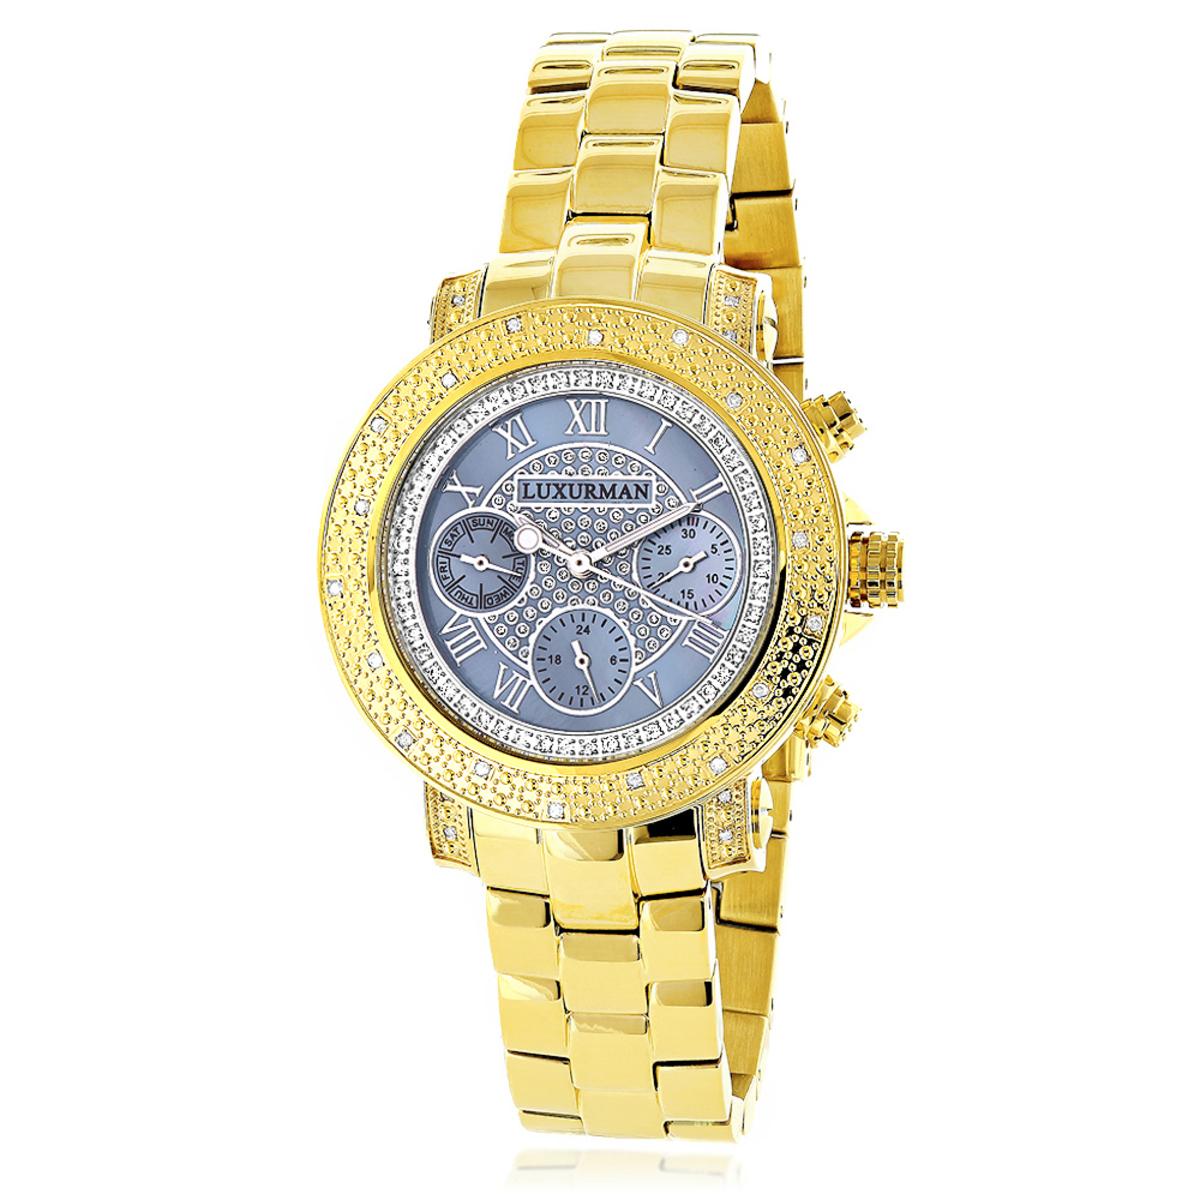 Luxurman Real Diamond Watch for Women 0.3ct Yellow Gold Plated Montana